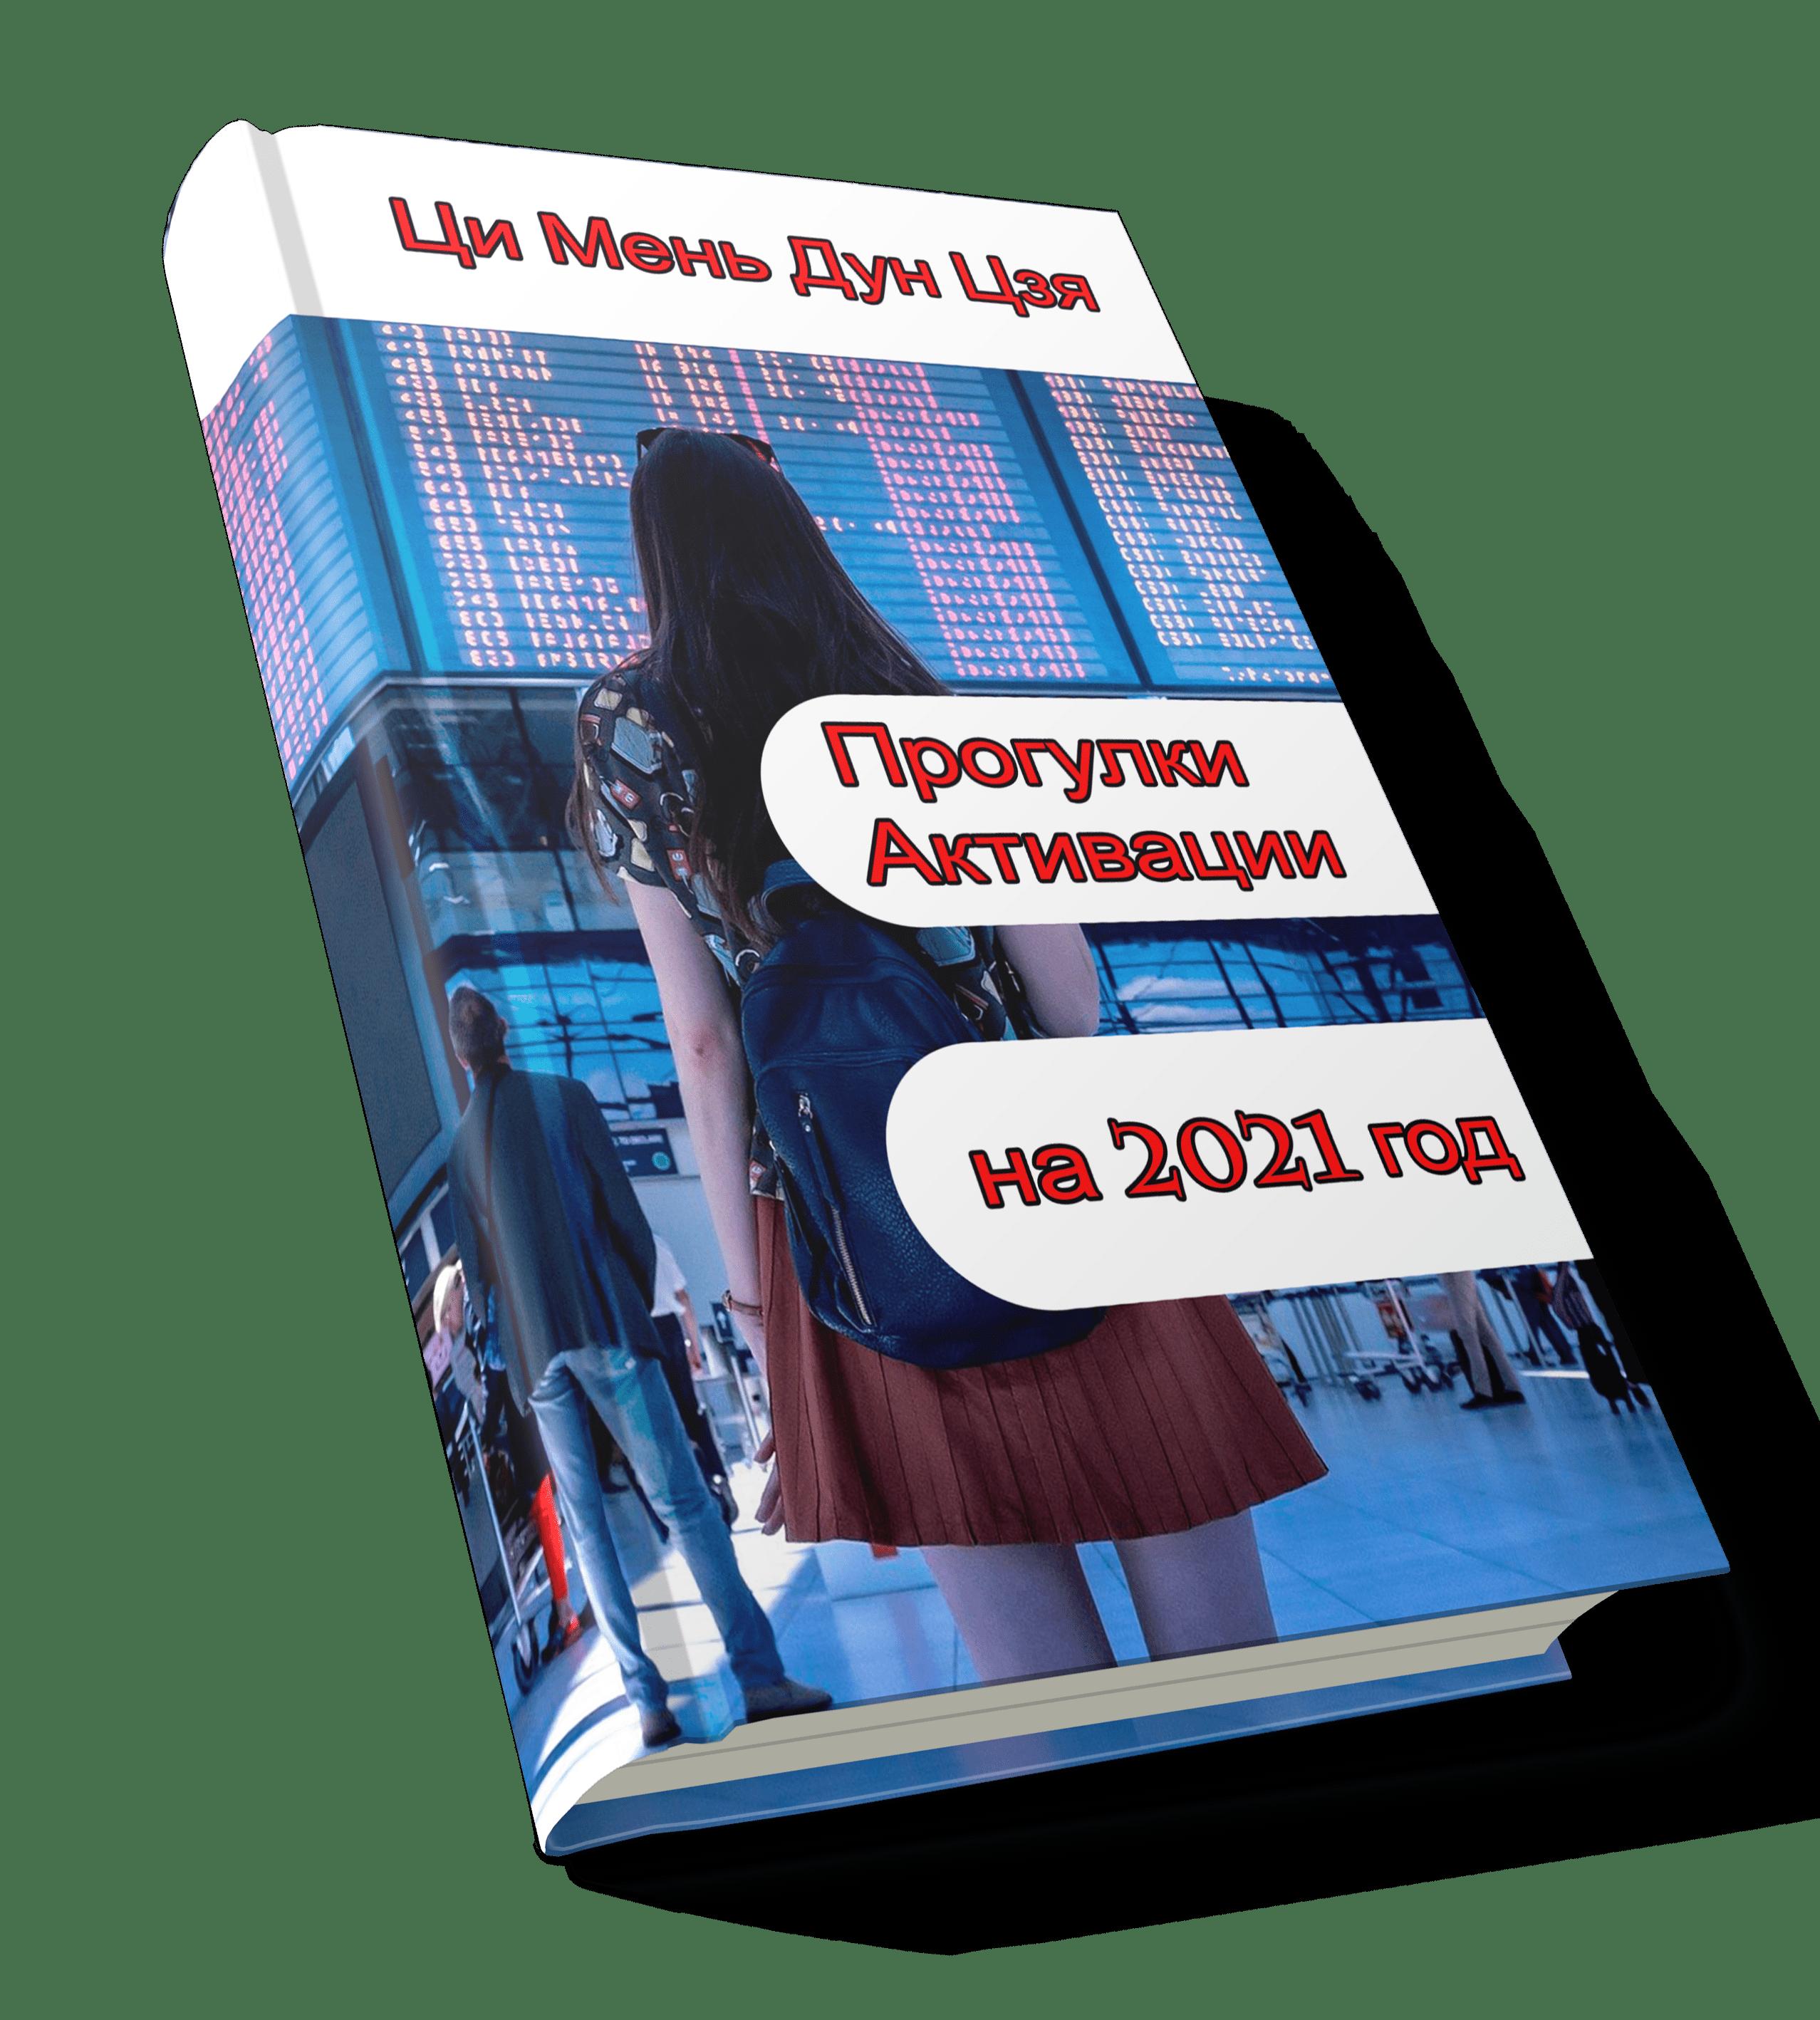 Прогулки Активации Ци Мень Дун Цзя на 2021 год